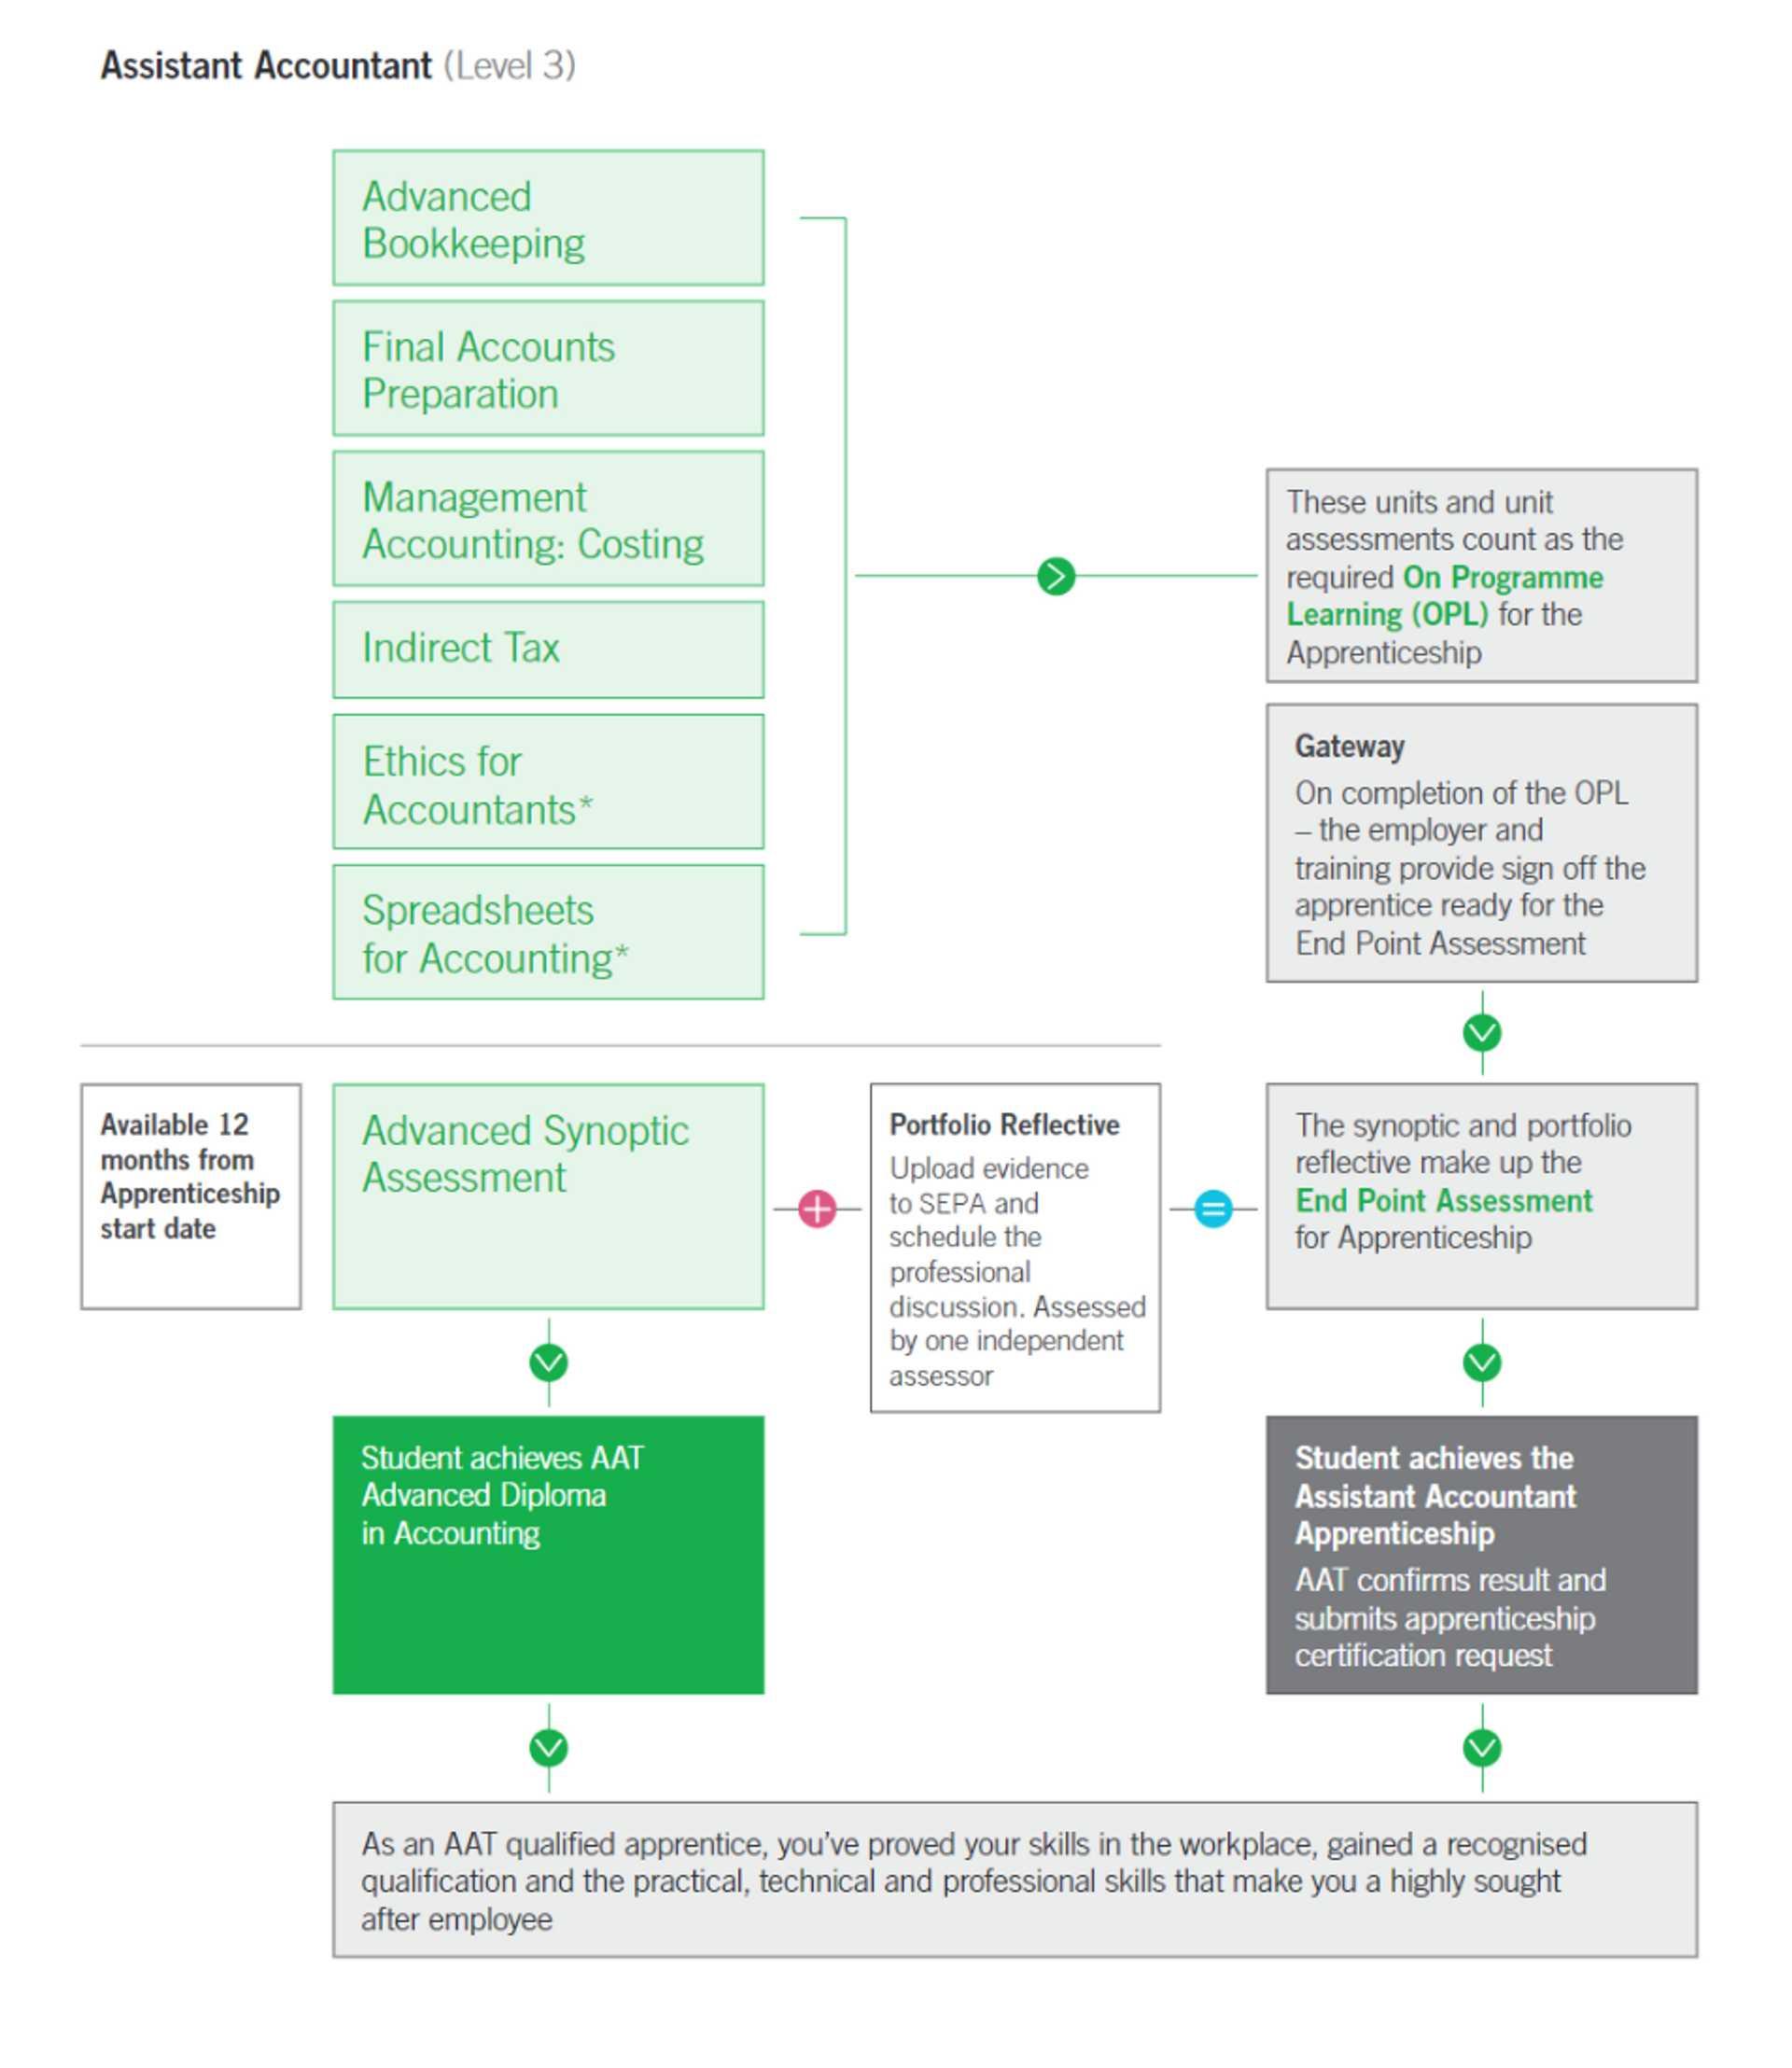 Assistant Accountant apprenticeship EPA pathway